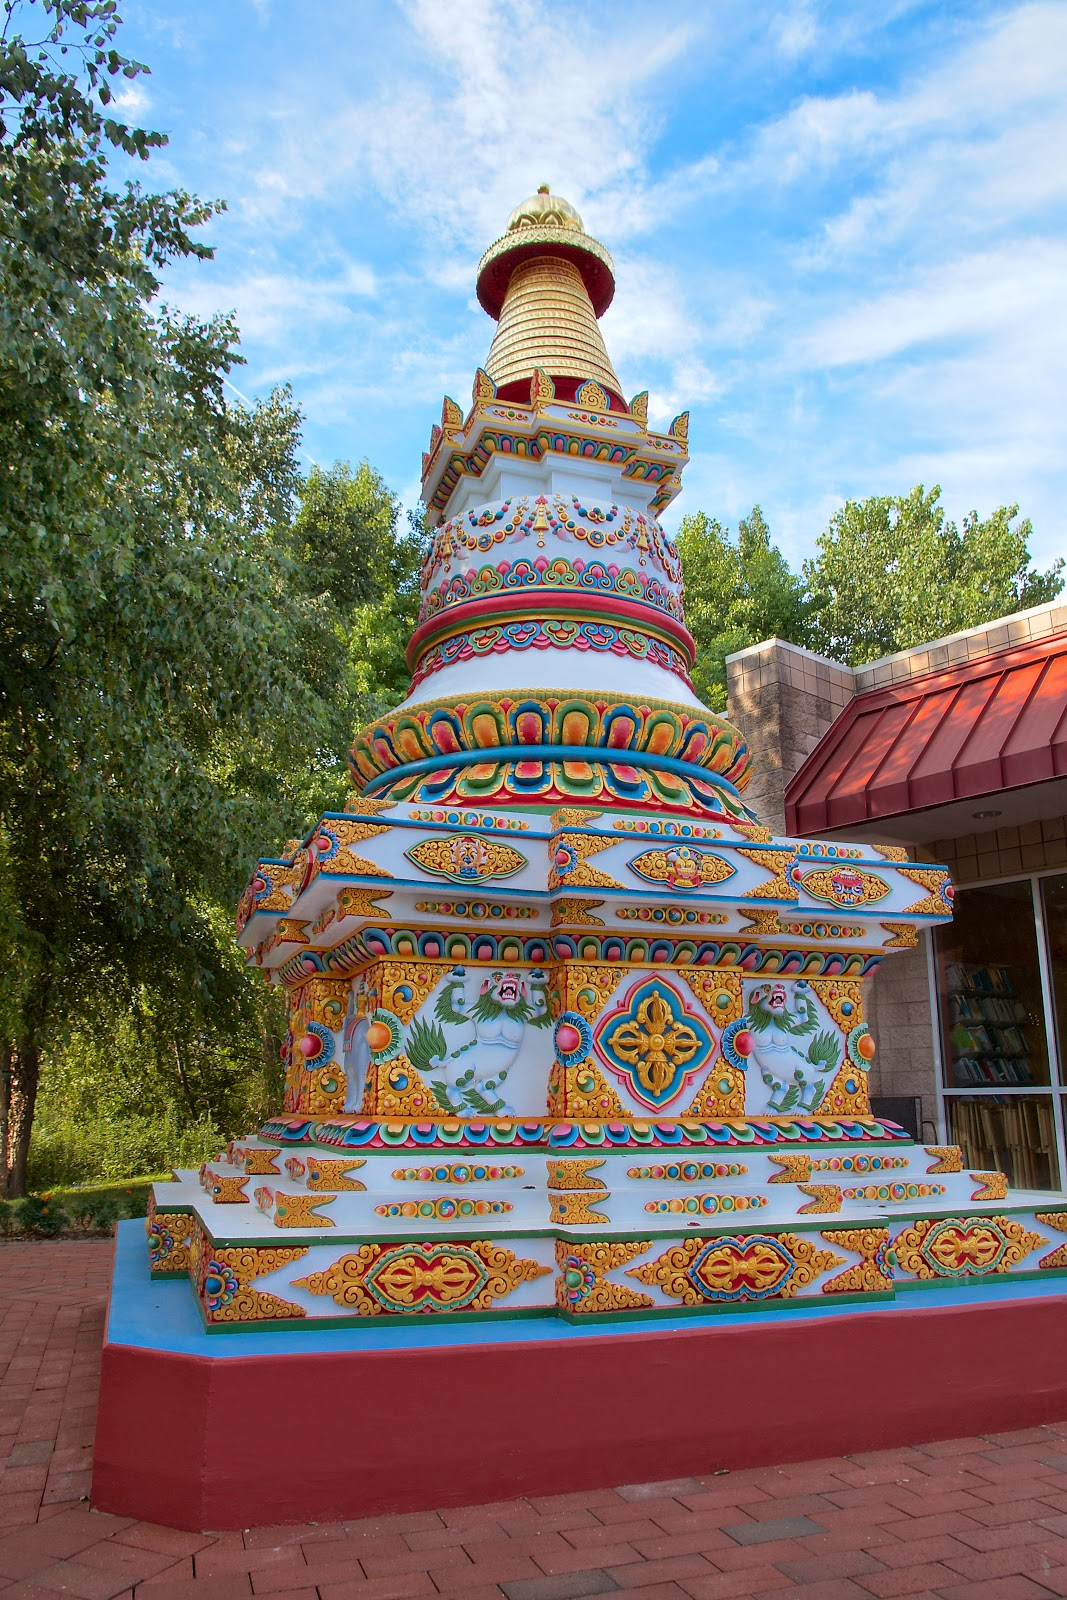 Kadampa Center's Kadampa Stupa. Raleigh, NC, USA. Photo by David Strevel.